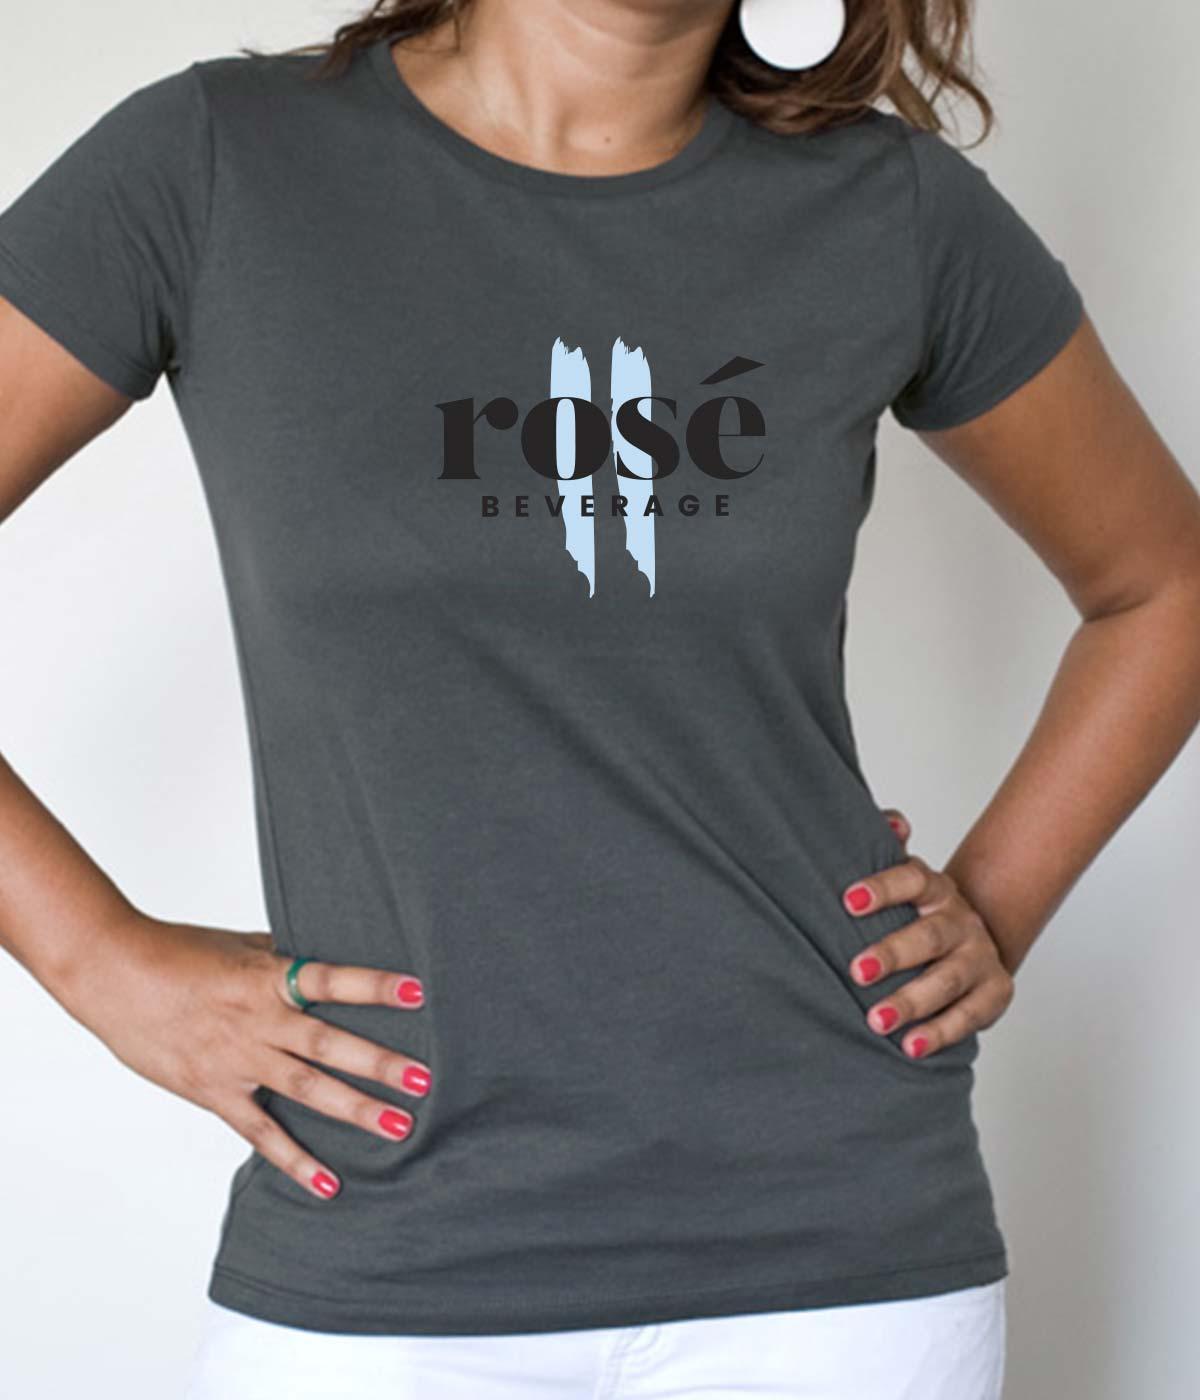 dc1c133e898f Unisex κοντομάνικο T-Shirt με στάμπα φιγούρα Rose.